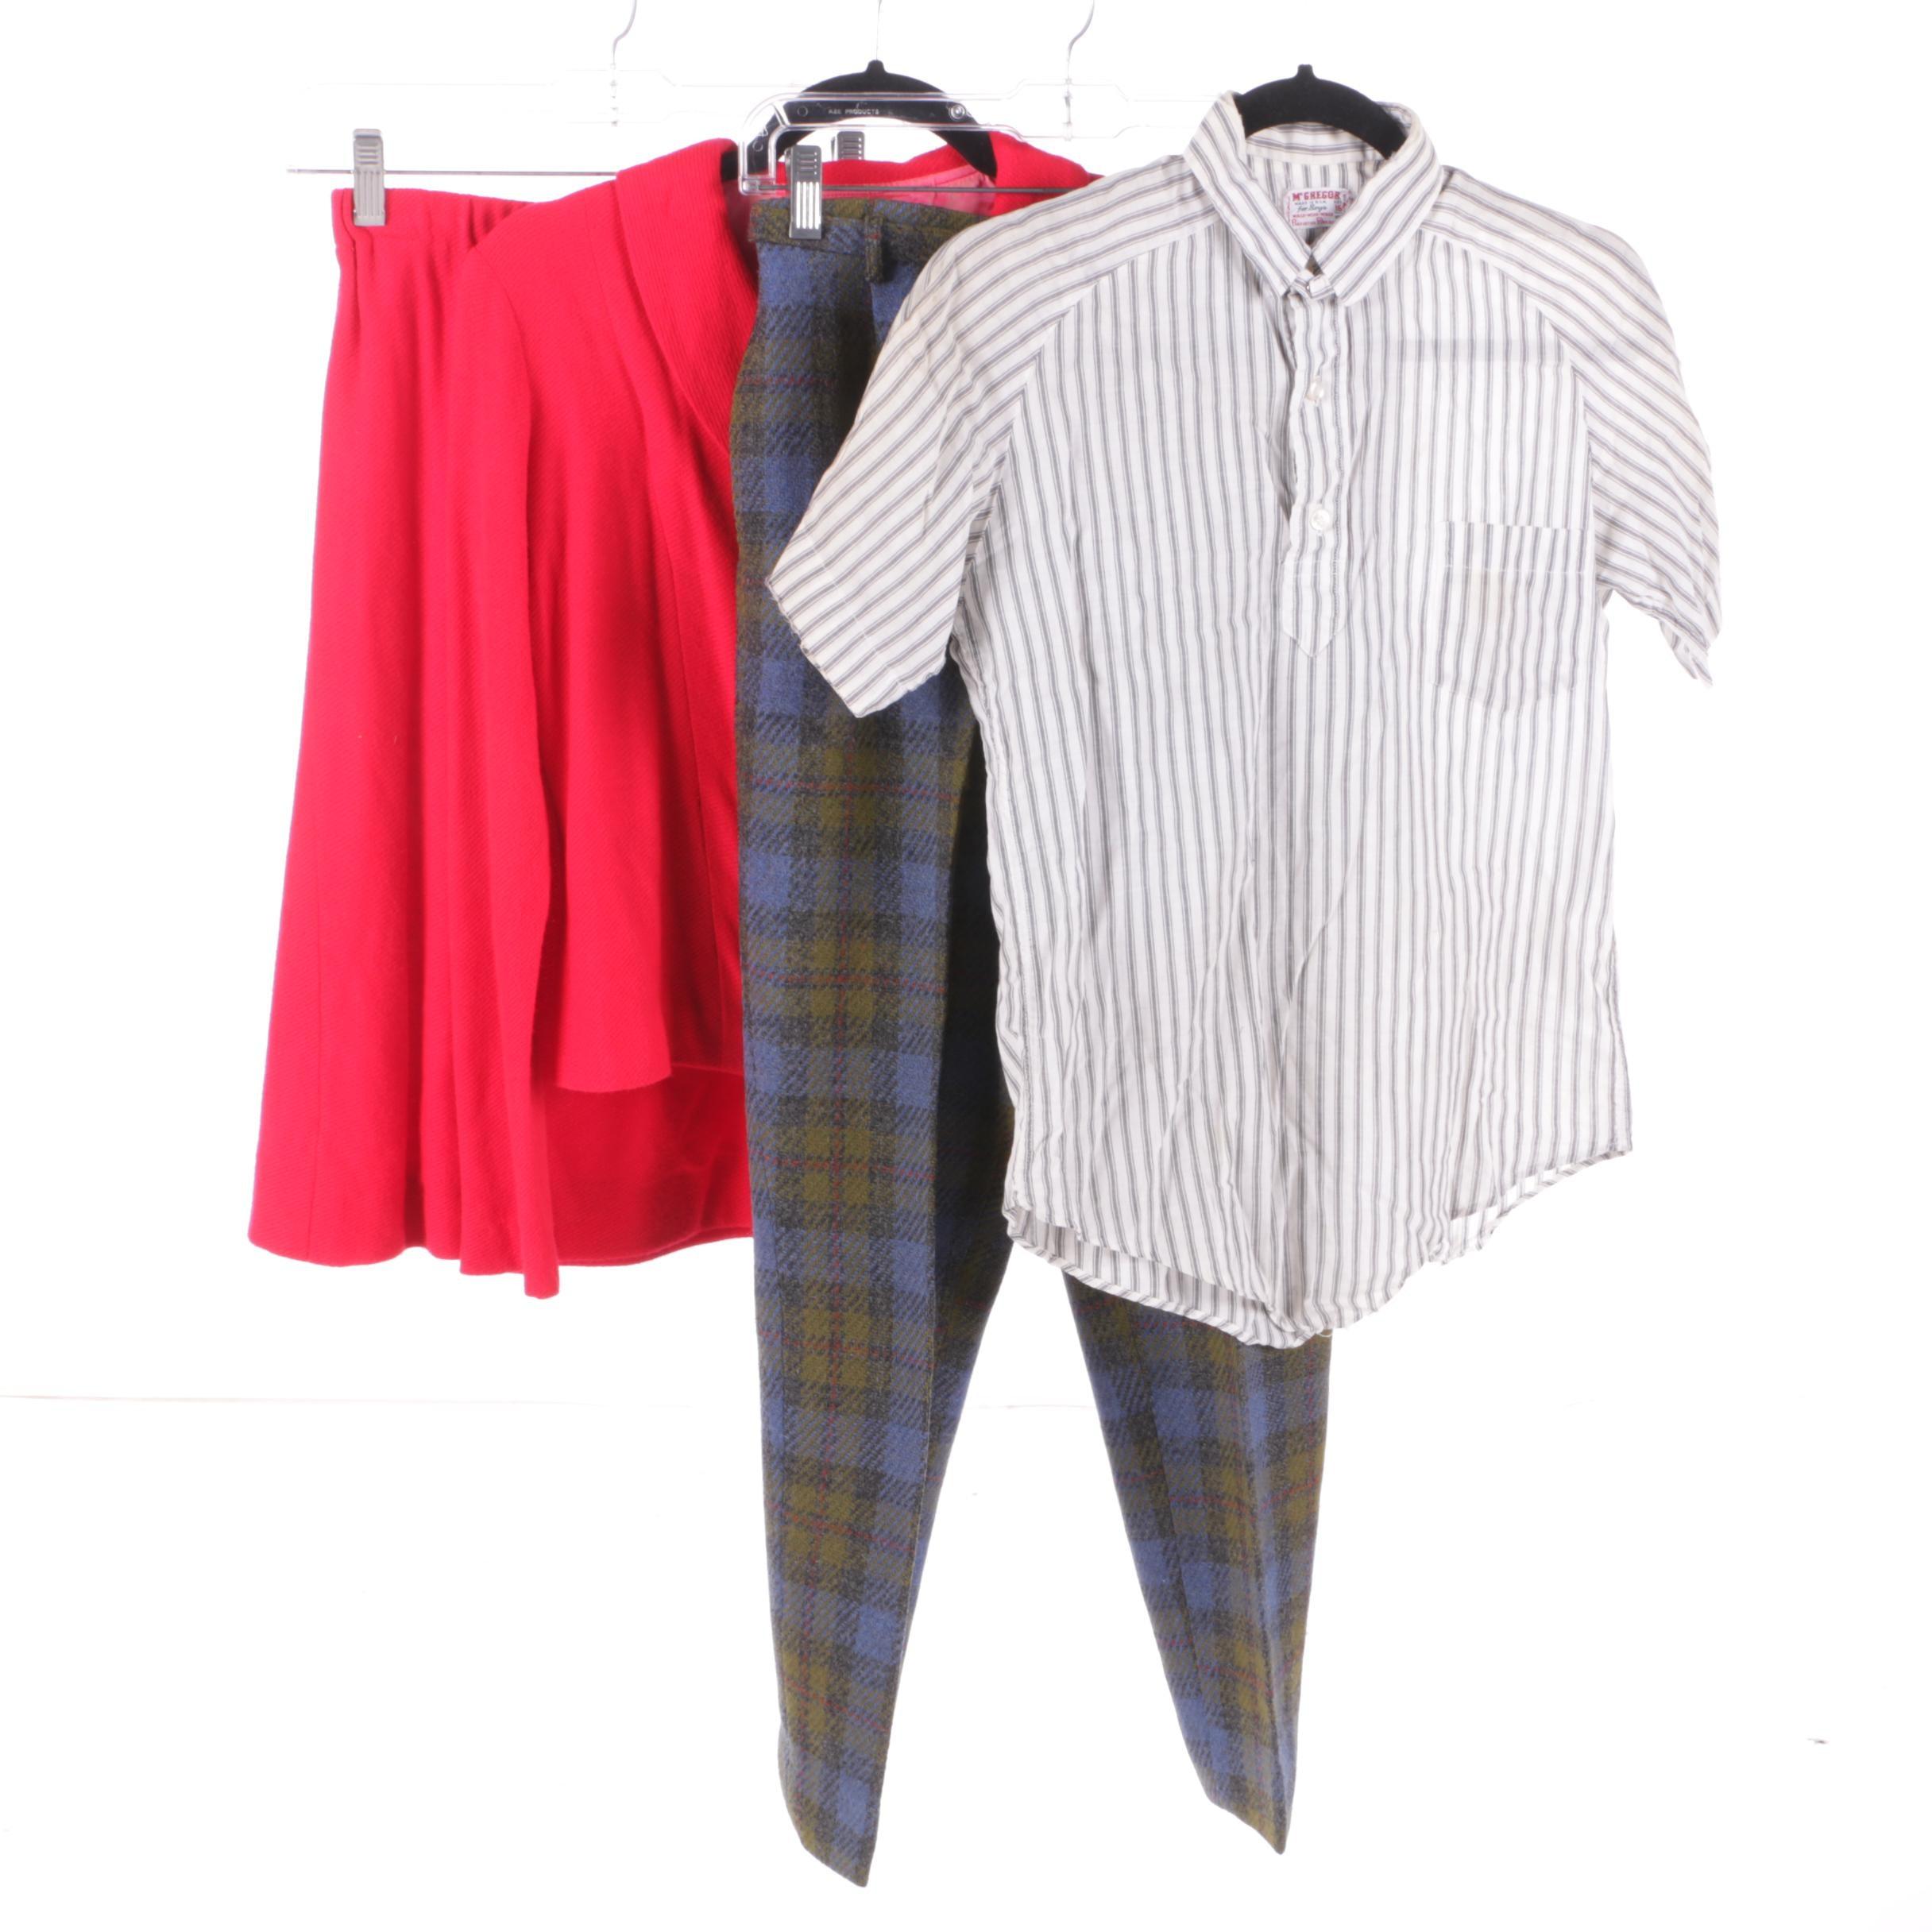 Women's Vintage Skirt Suit, Plaid Pants and Boys' McGregor Top